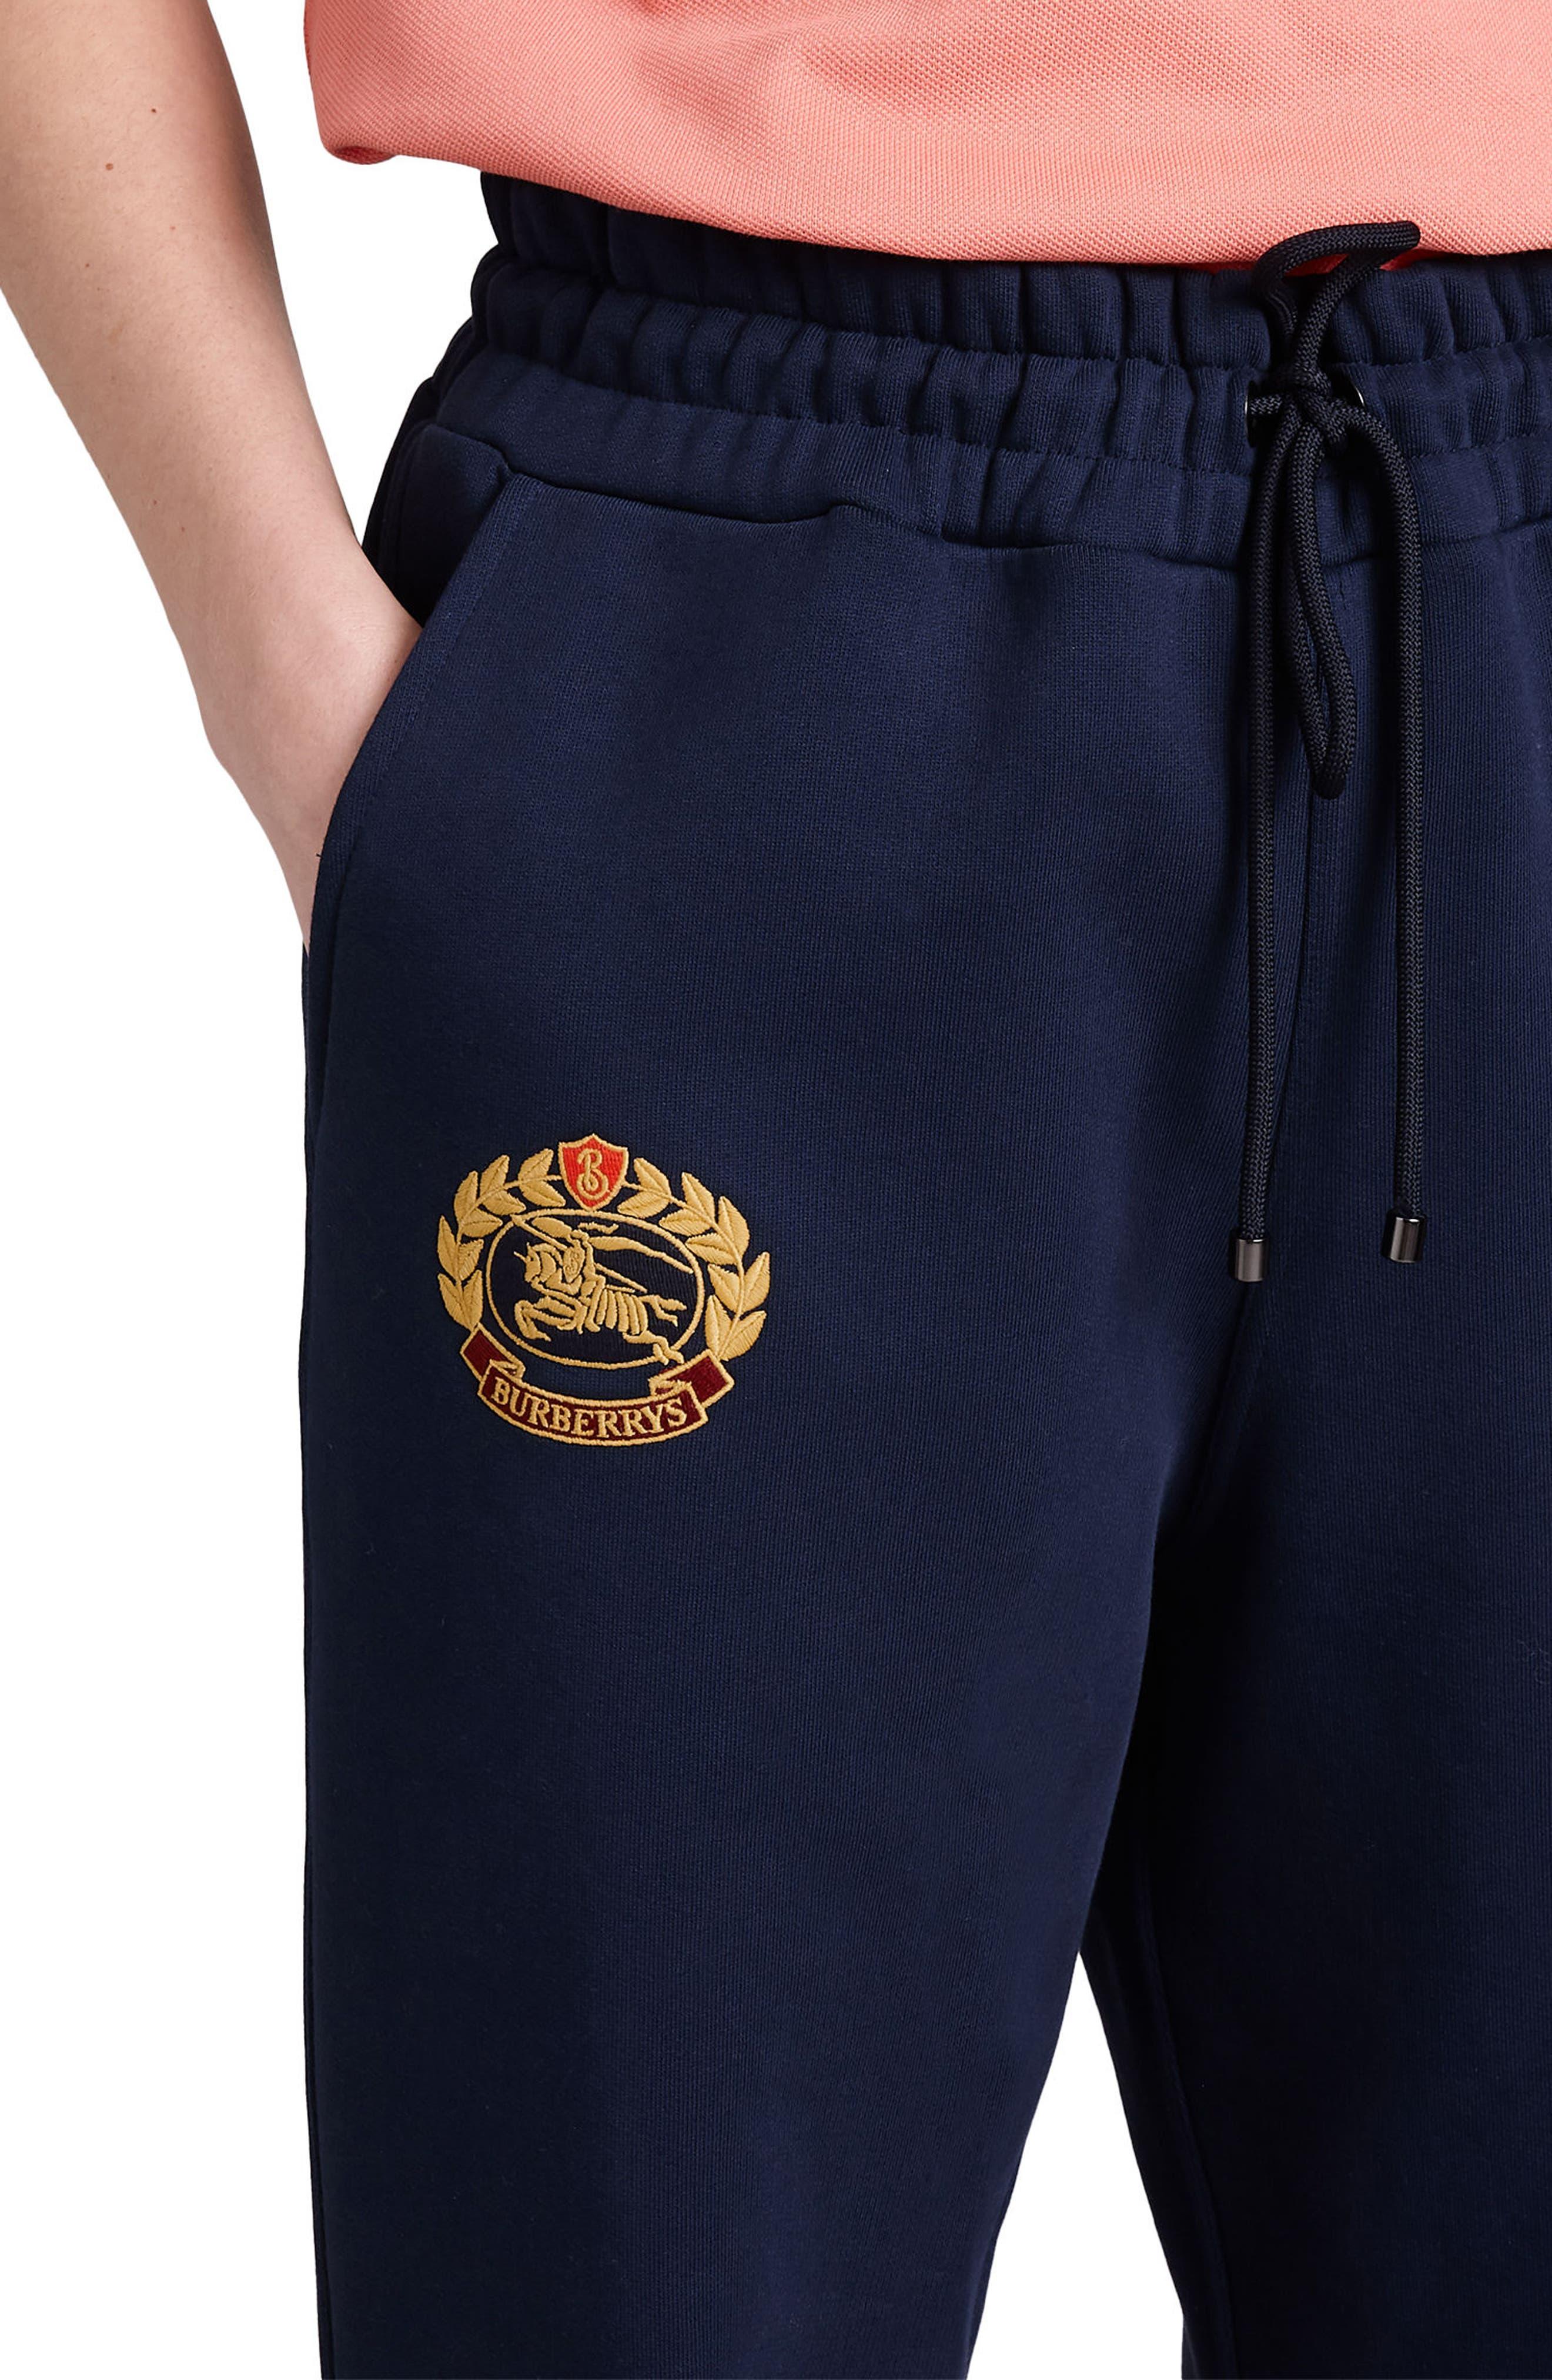 Vintage Crest Sweatpants,                             Alternate thumbnail 3, color,                             MIDNIGHT BLUE